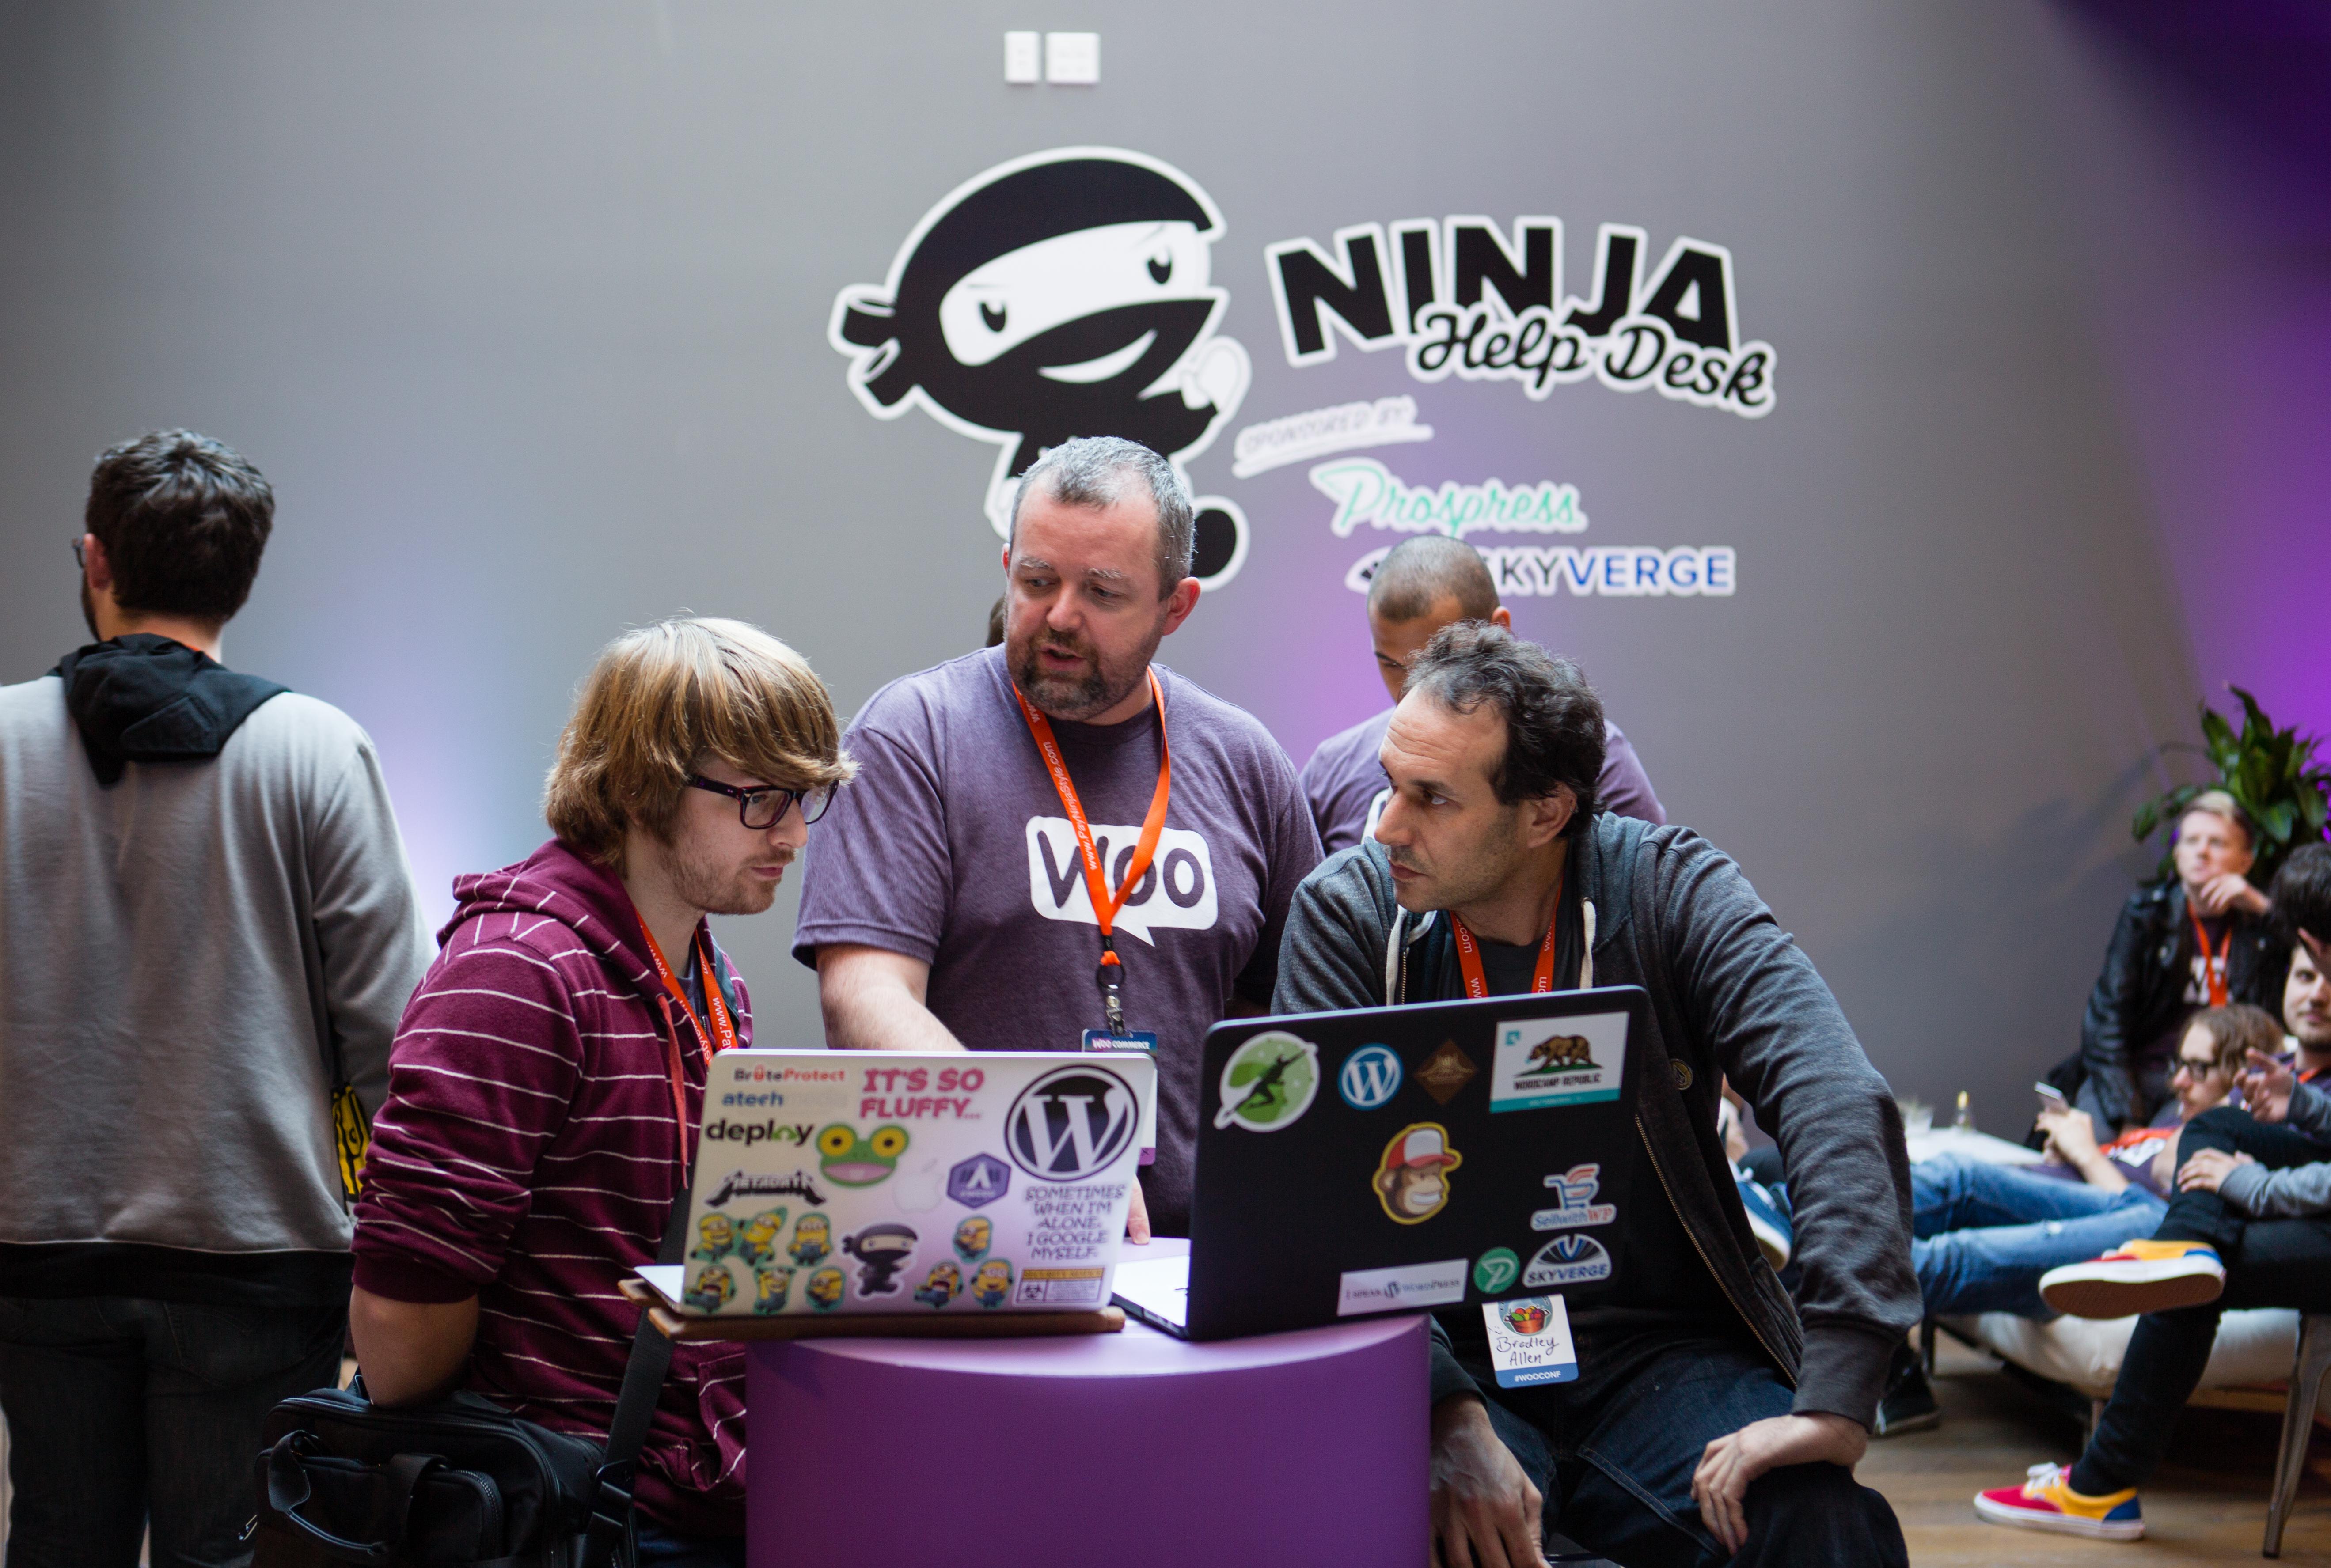 Ninja help desk